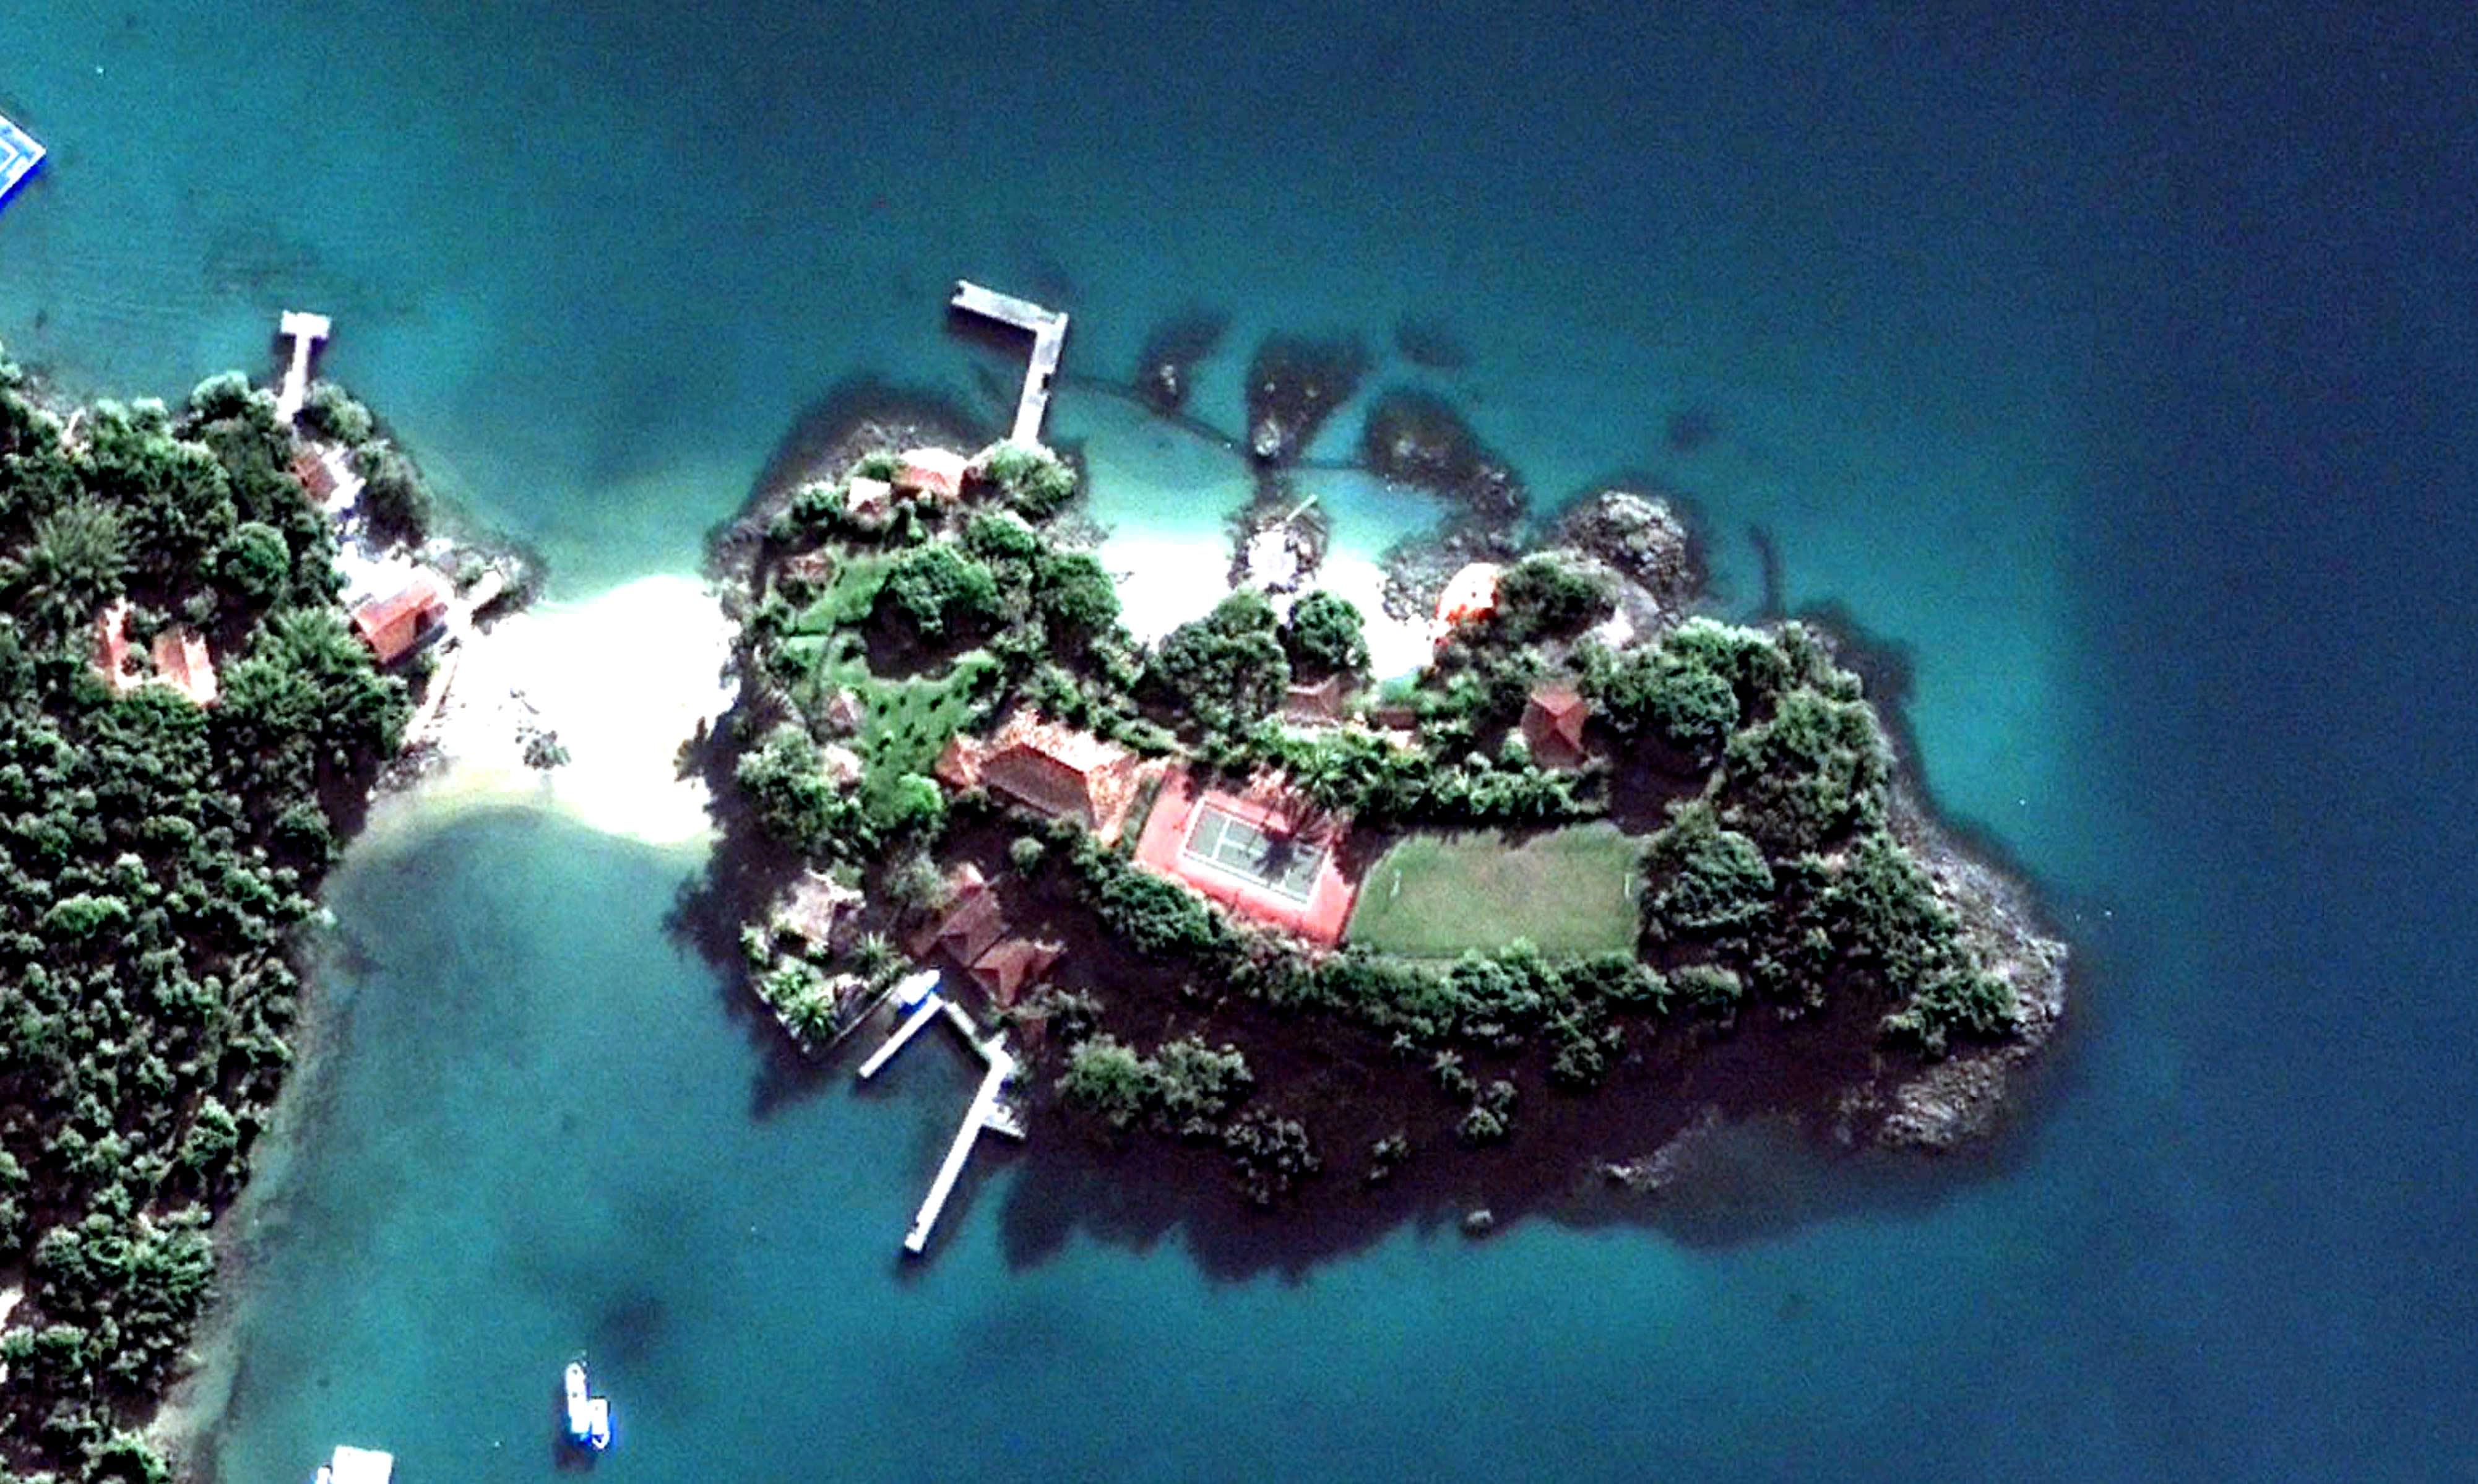 Piedade Island - Brazil, South America - Private Islands for Rent